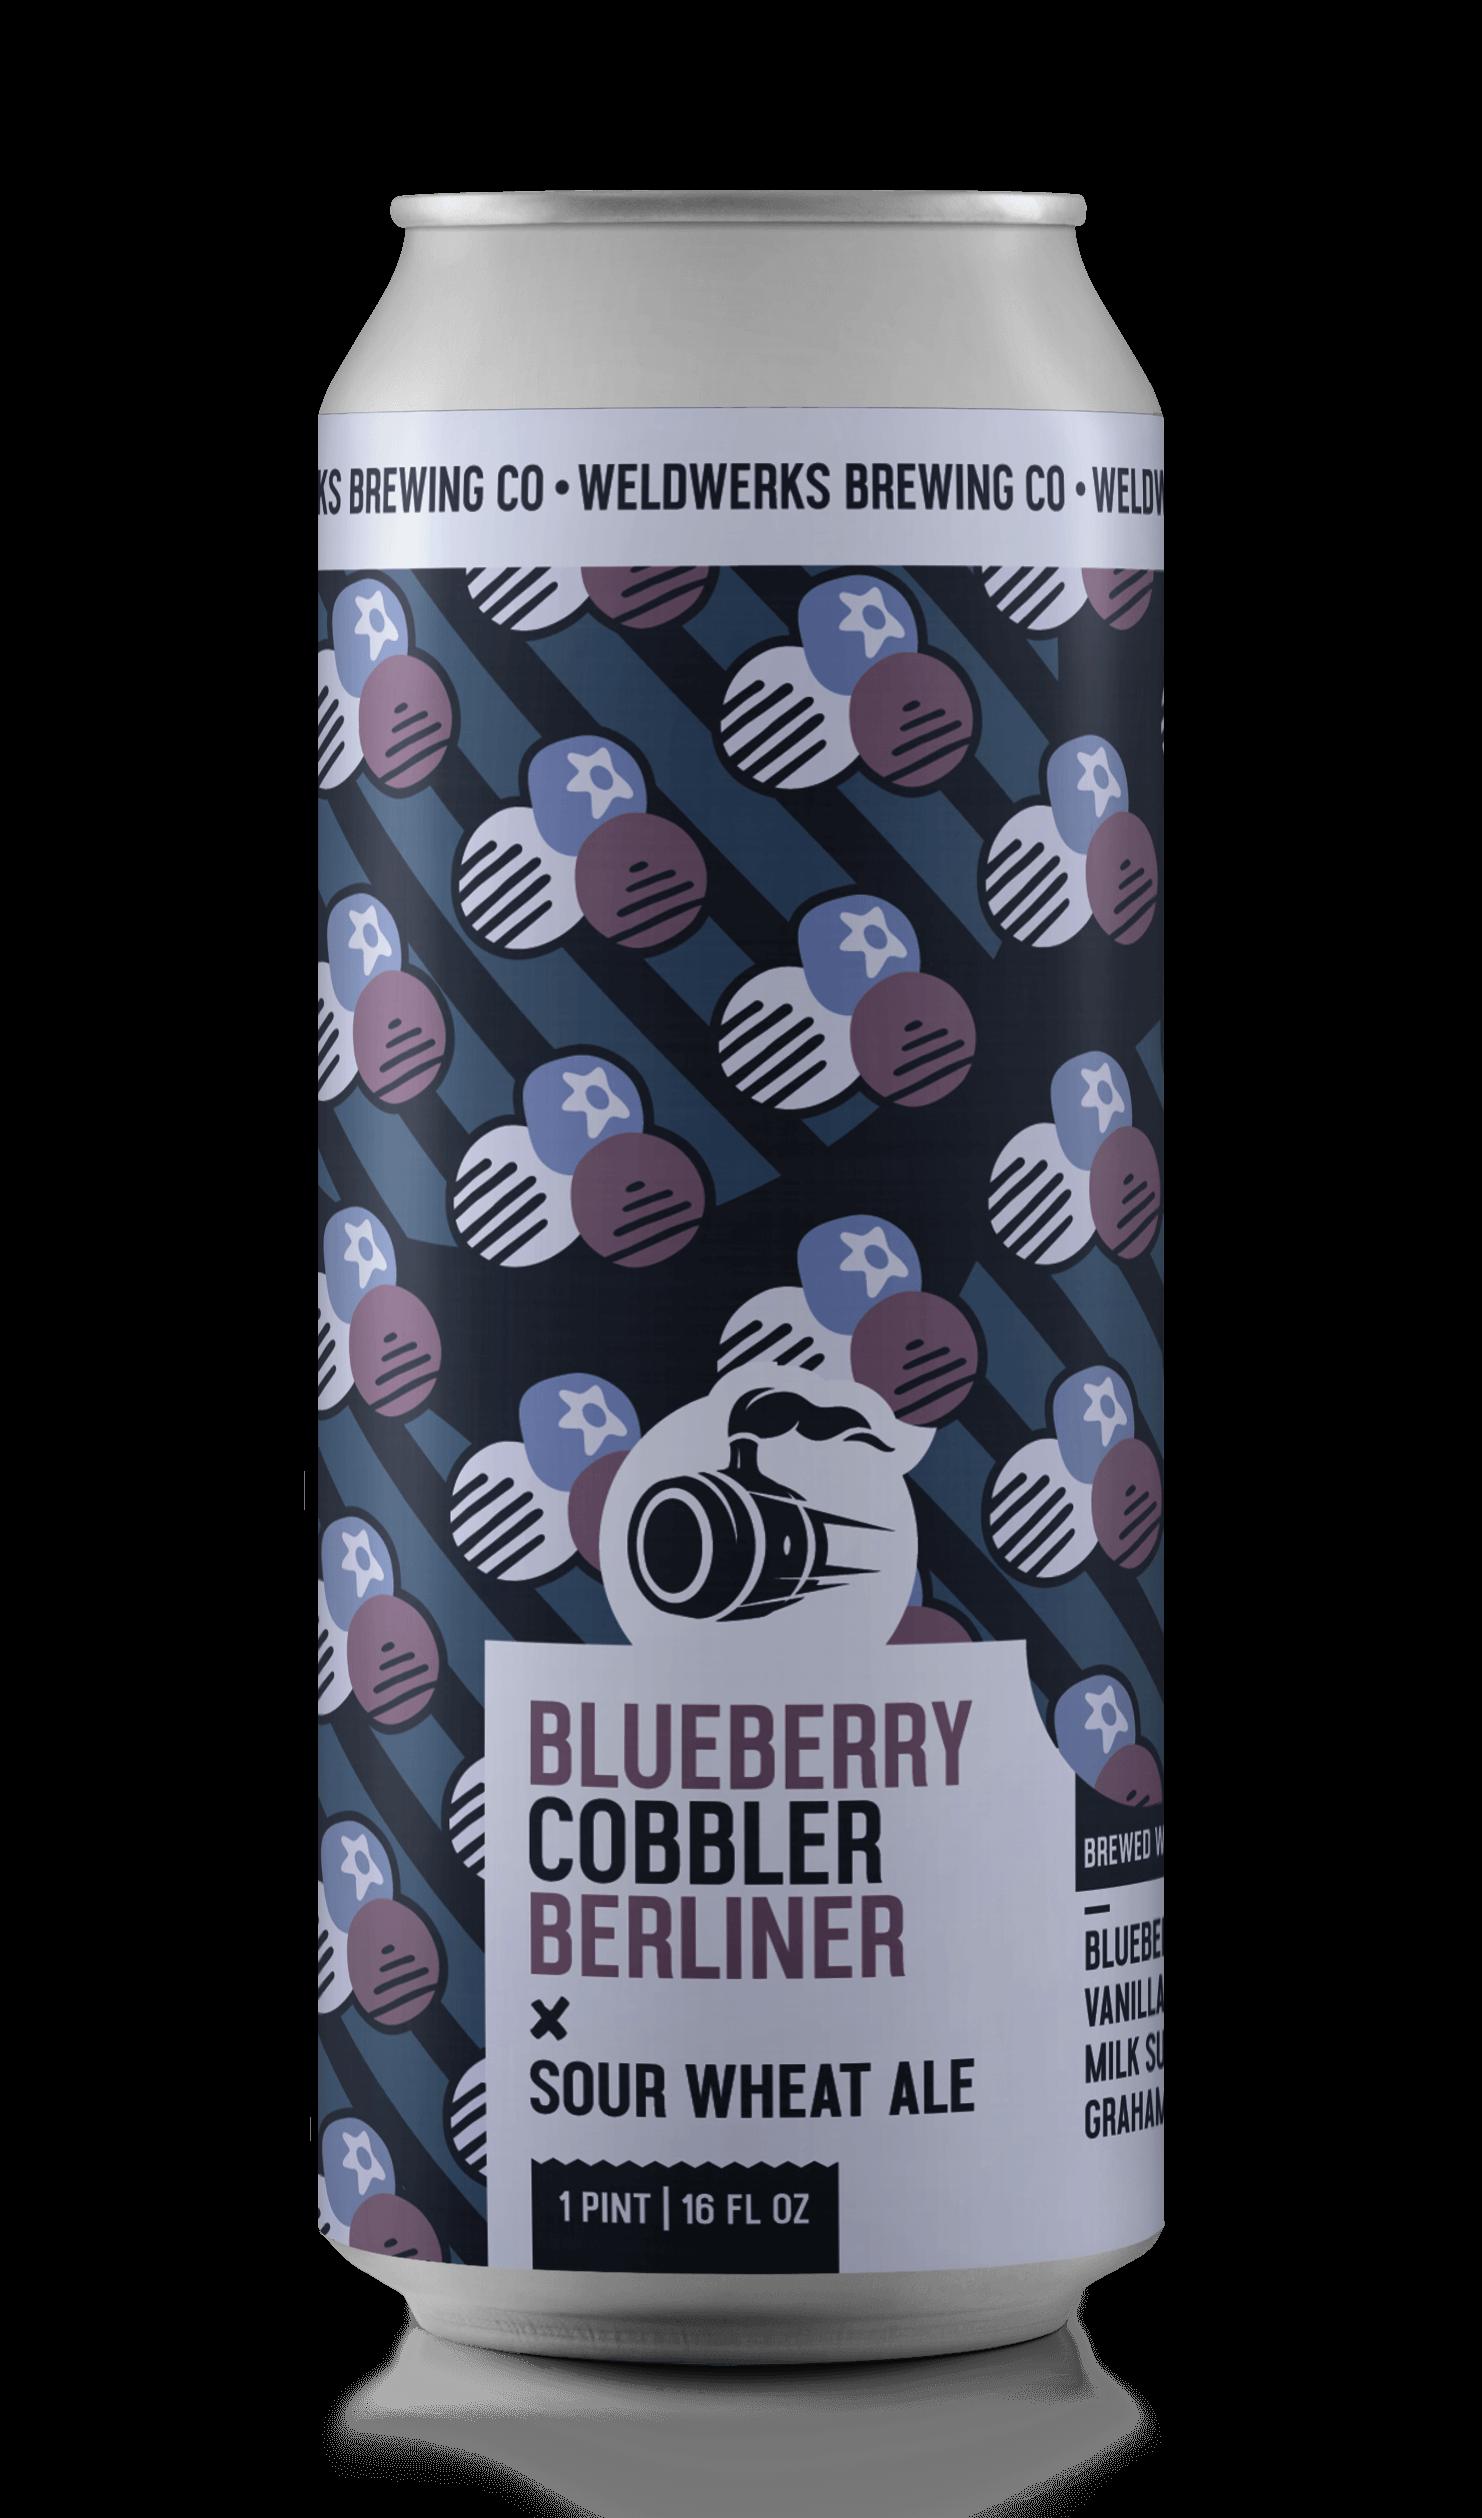 Blueberry Cobbler Berliner